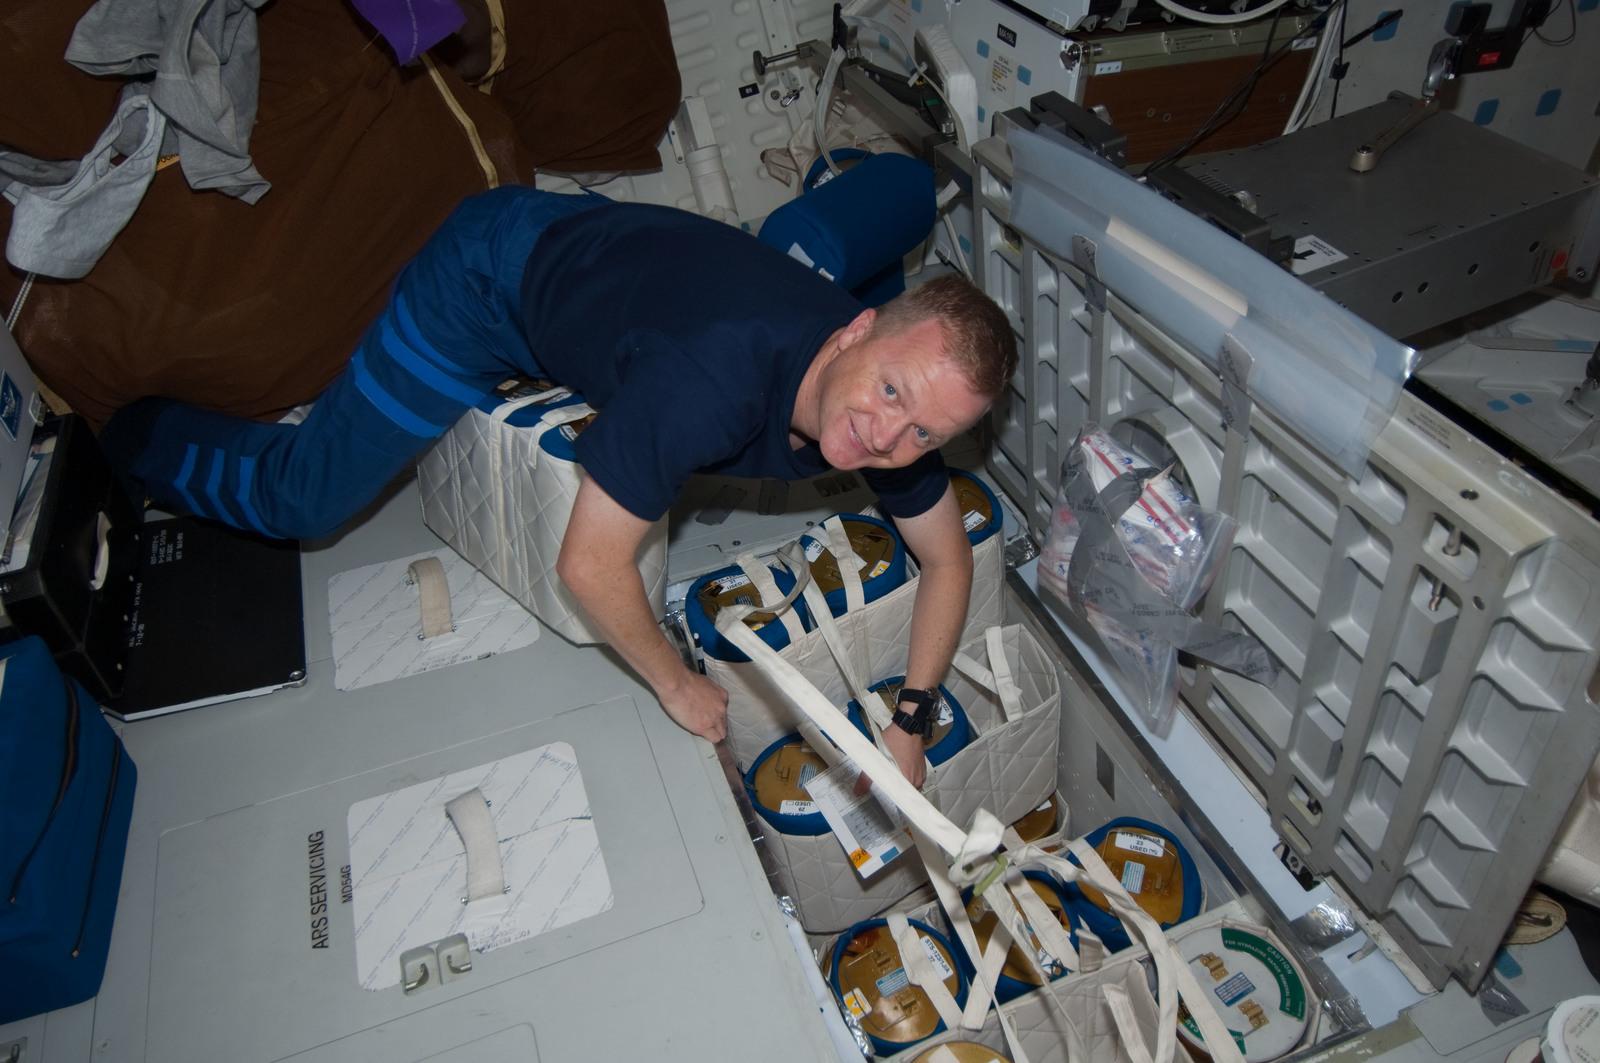 S126E011514 - STS-126 - Boe on MDDK